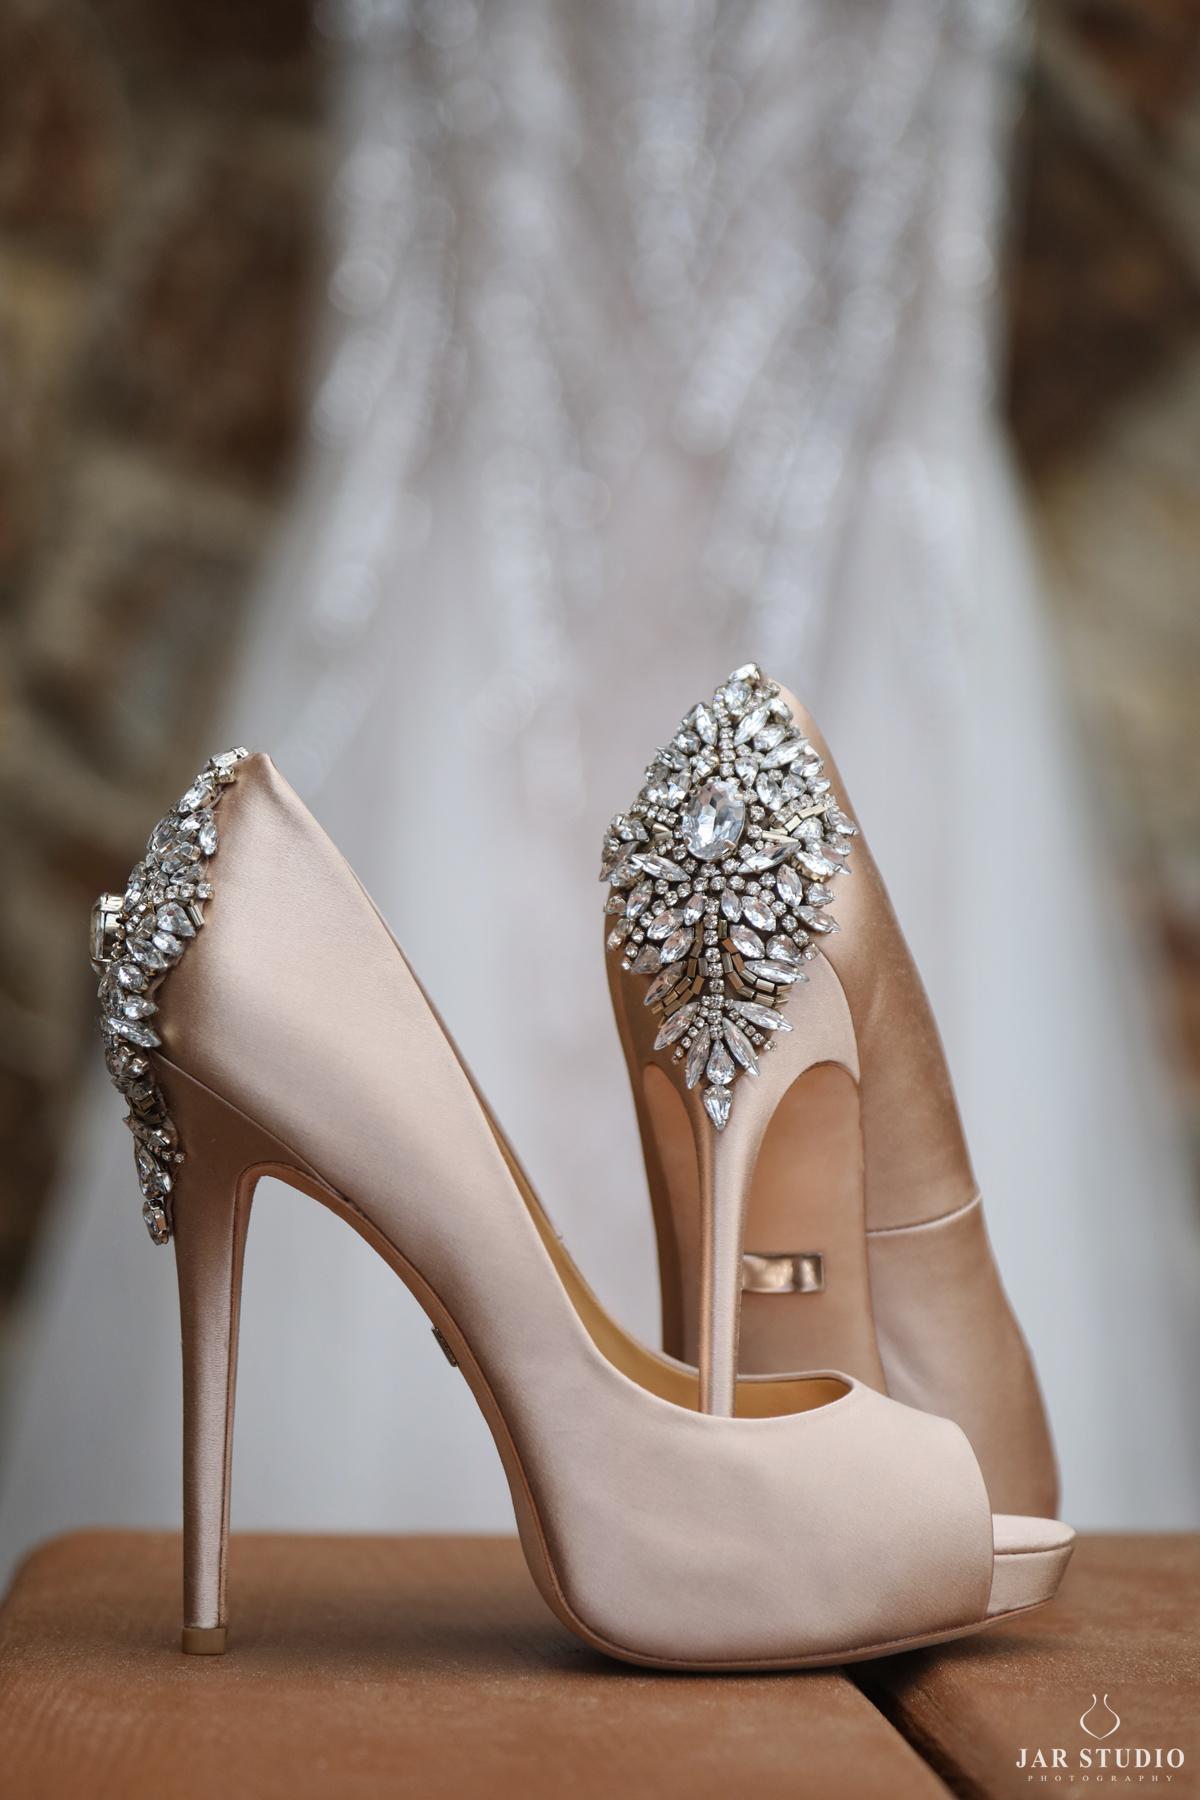 02-unique-wedding-shoes-fashion-jarstudio.jpg